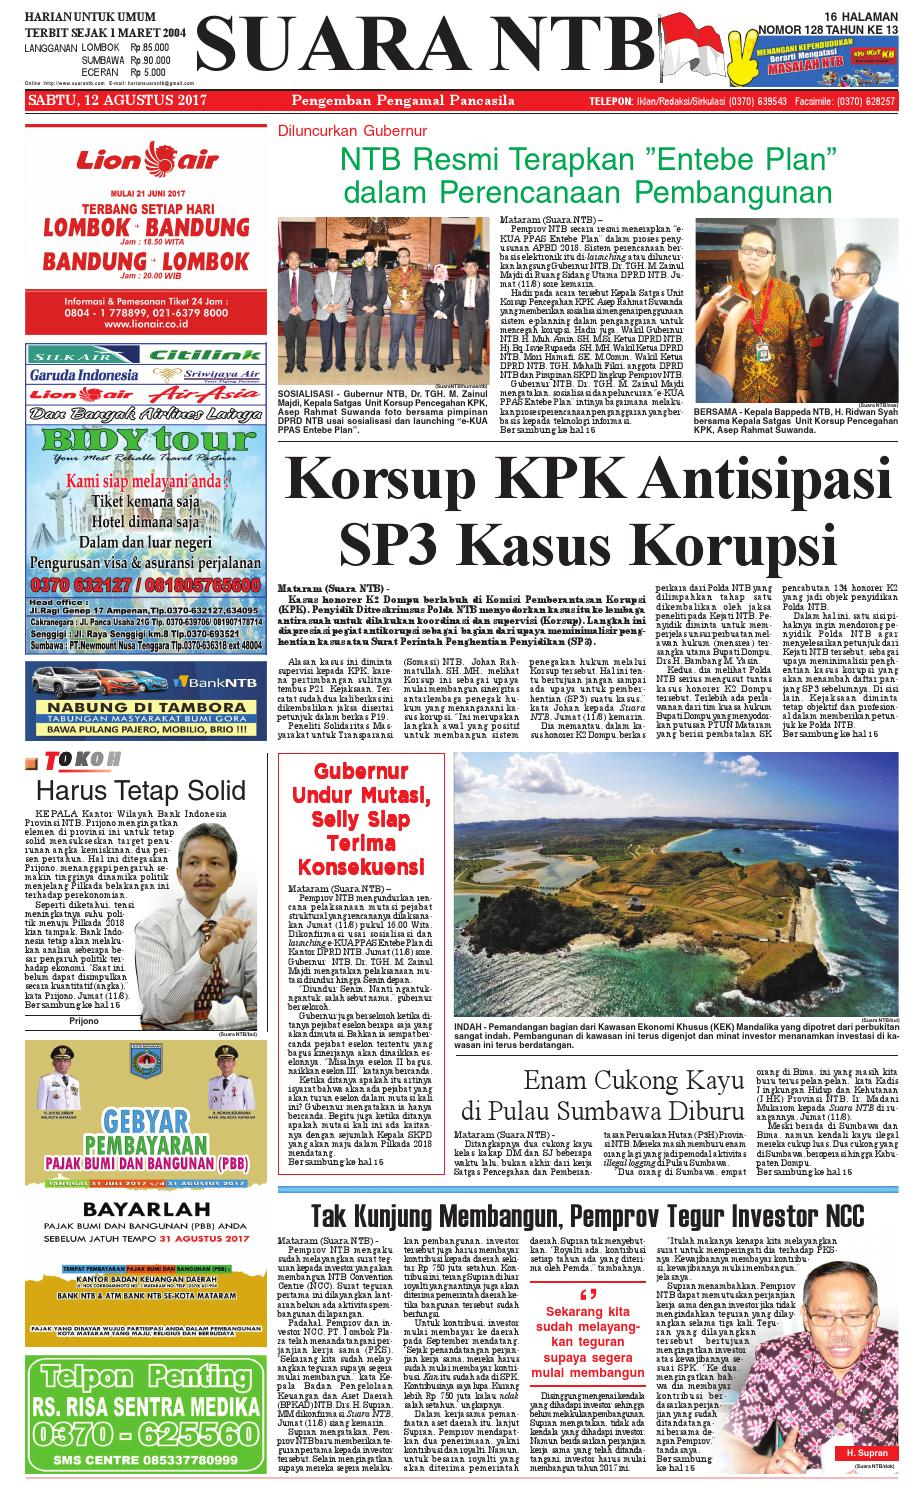 Edisi 12 Agustus 2017 Suara Ntb By E Paper Kmb Issuu